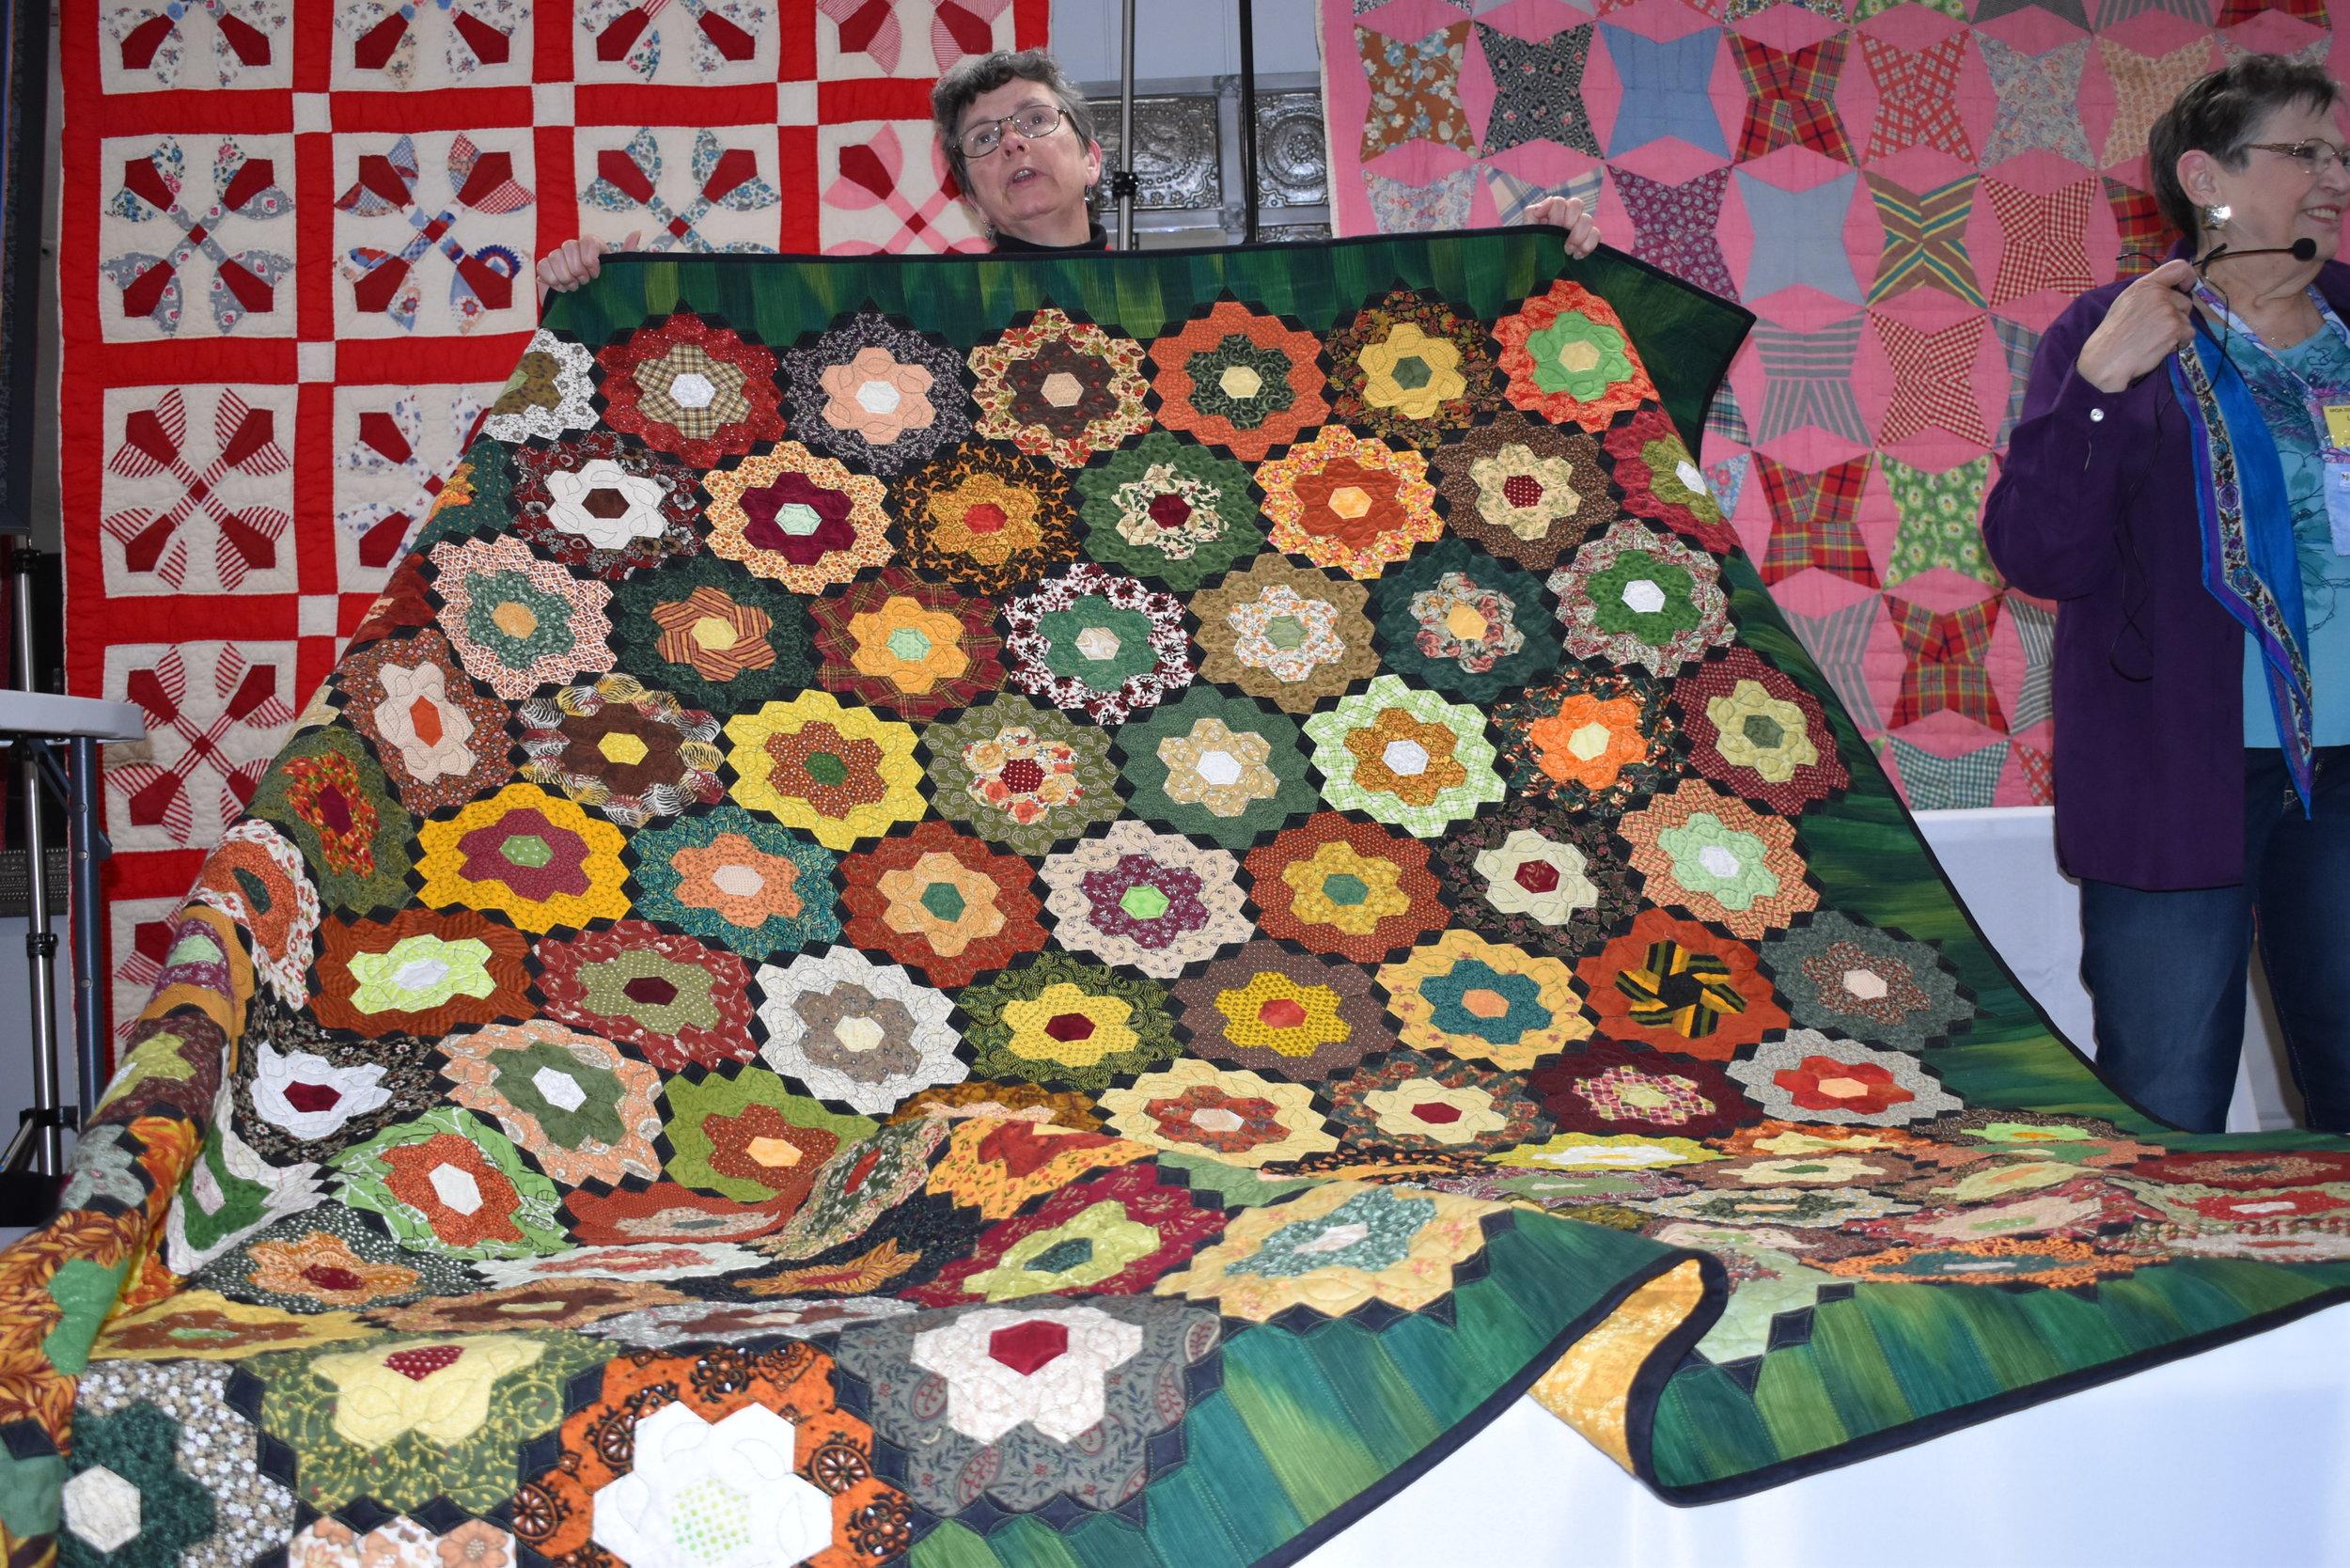 - Nancy Losure showed her machine pieced hexagon quilt. She teaches workshops on this technique.